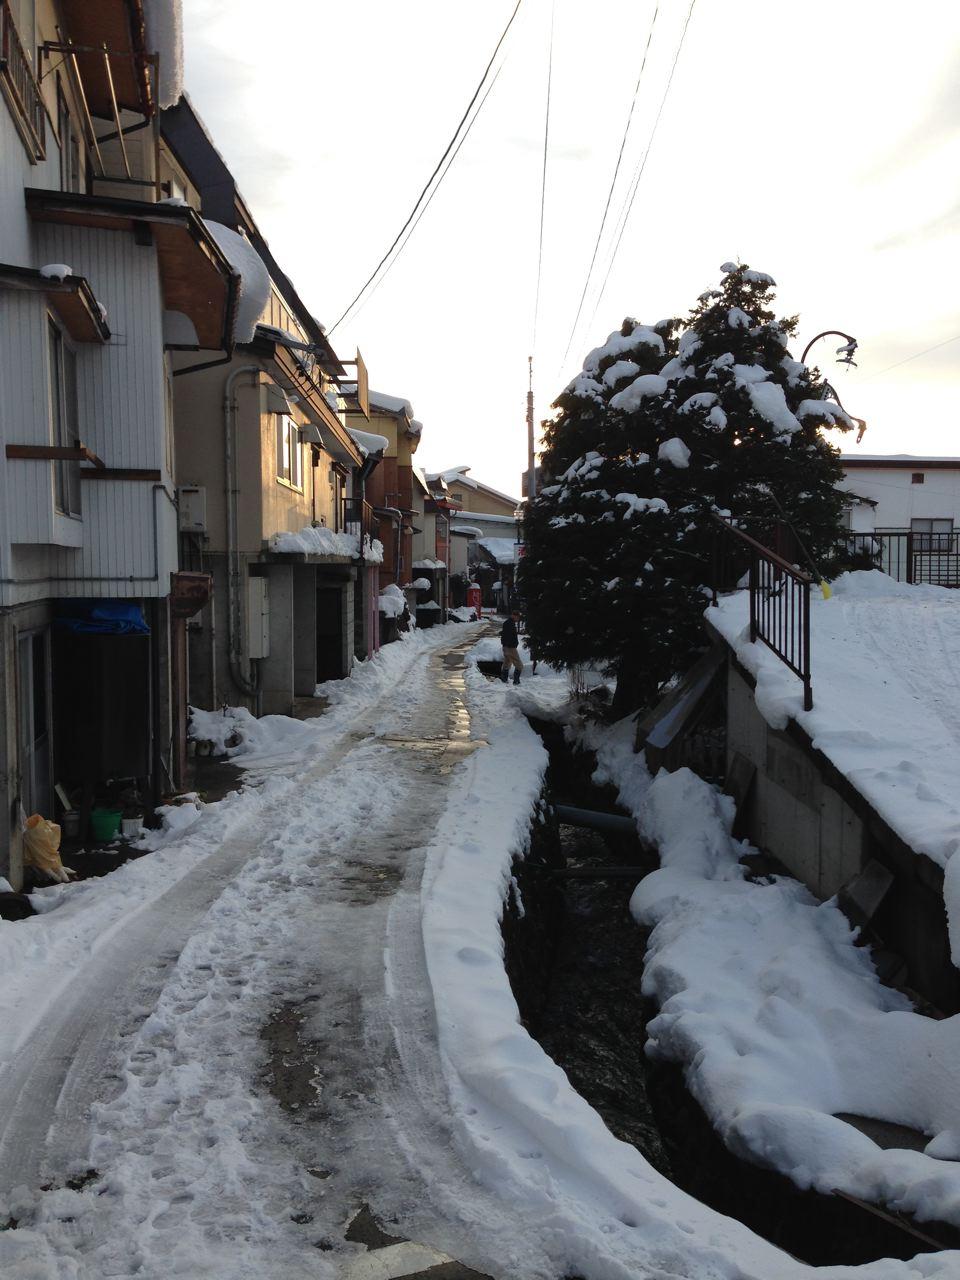 Sun set, small street, snow shovel Nozawa Style